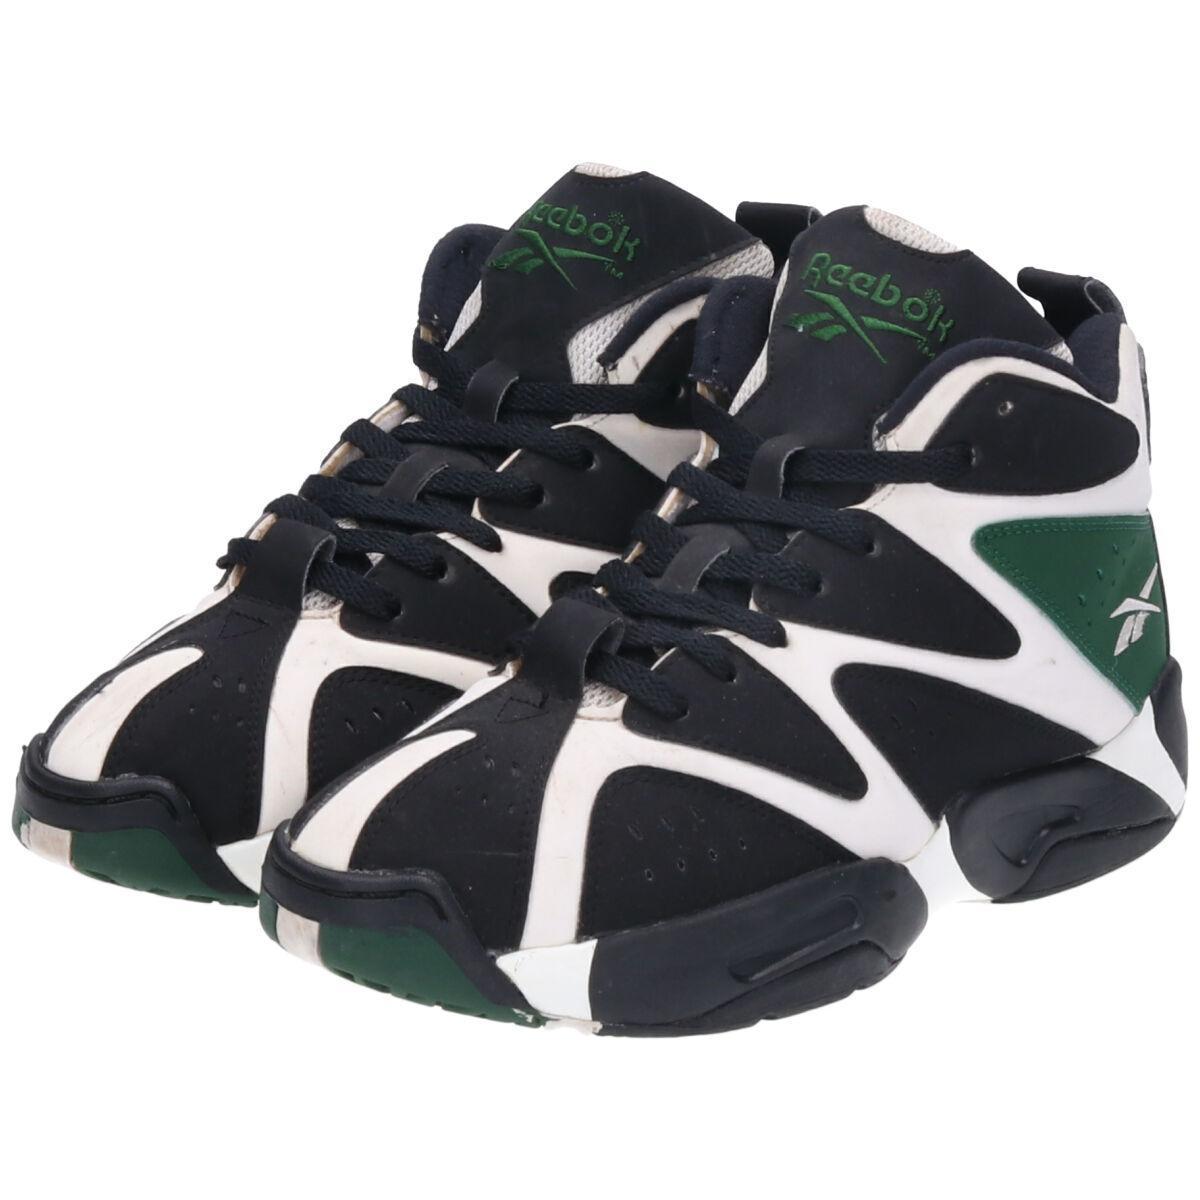 Reebok Men/'s Kamikaze IV M40834 Mid Retro Basketball Shoe Red Black Size 13M